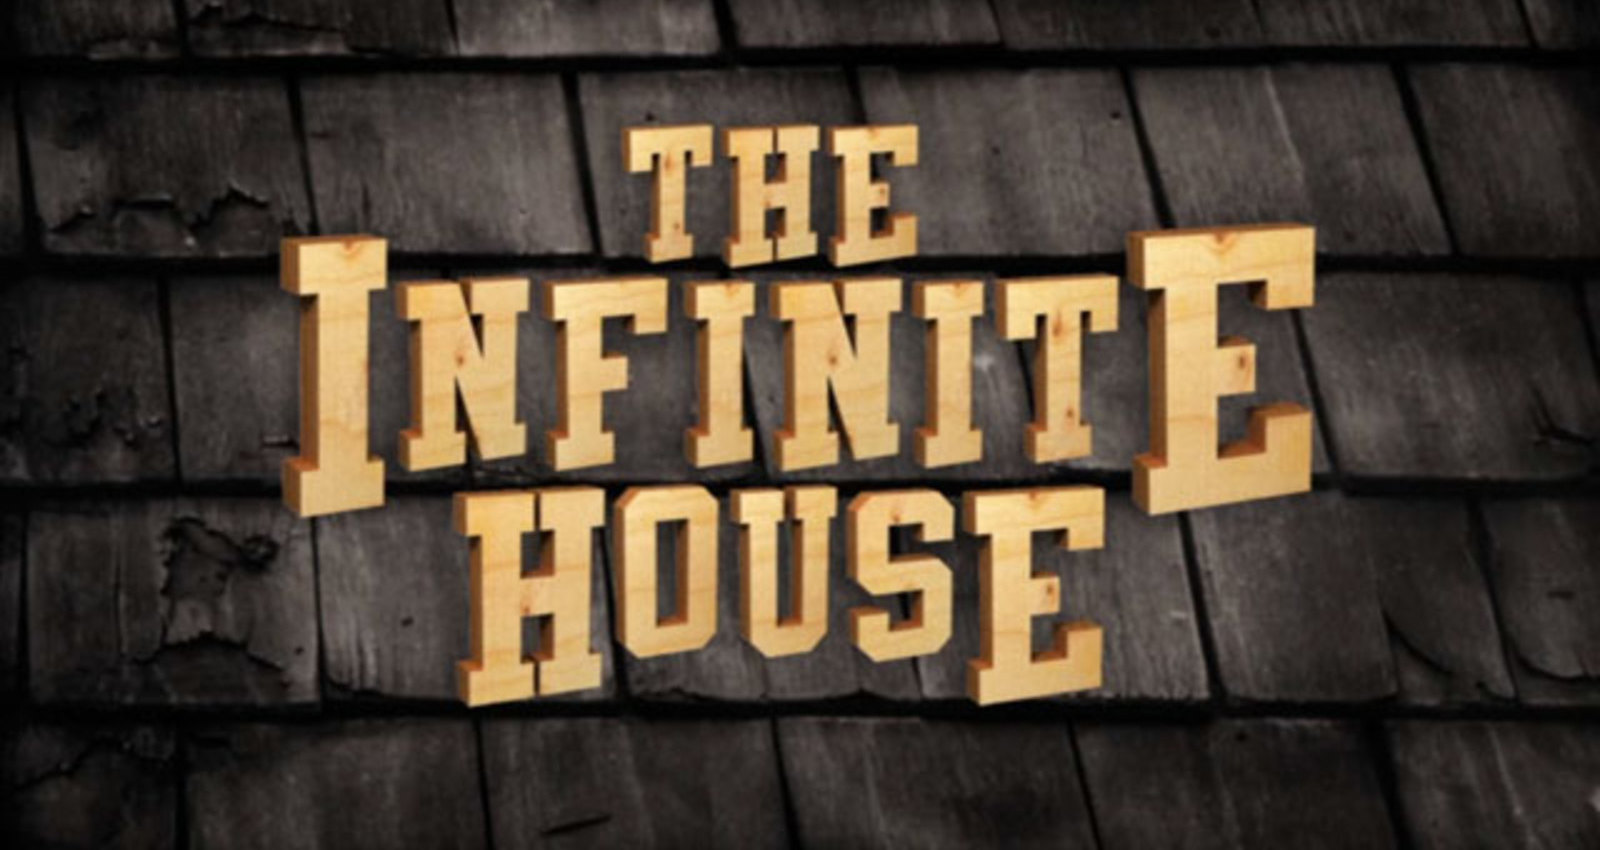 THE INFINITE HOUSE